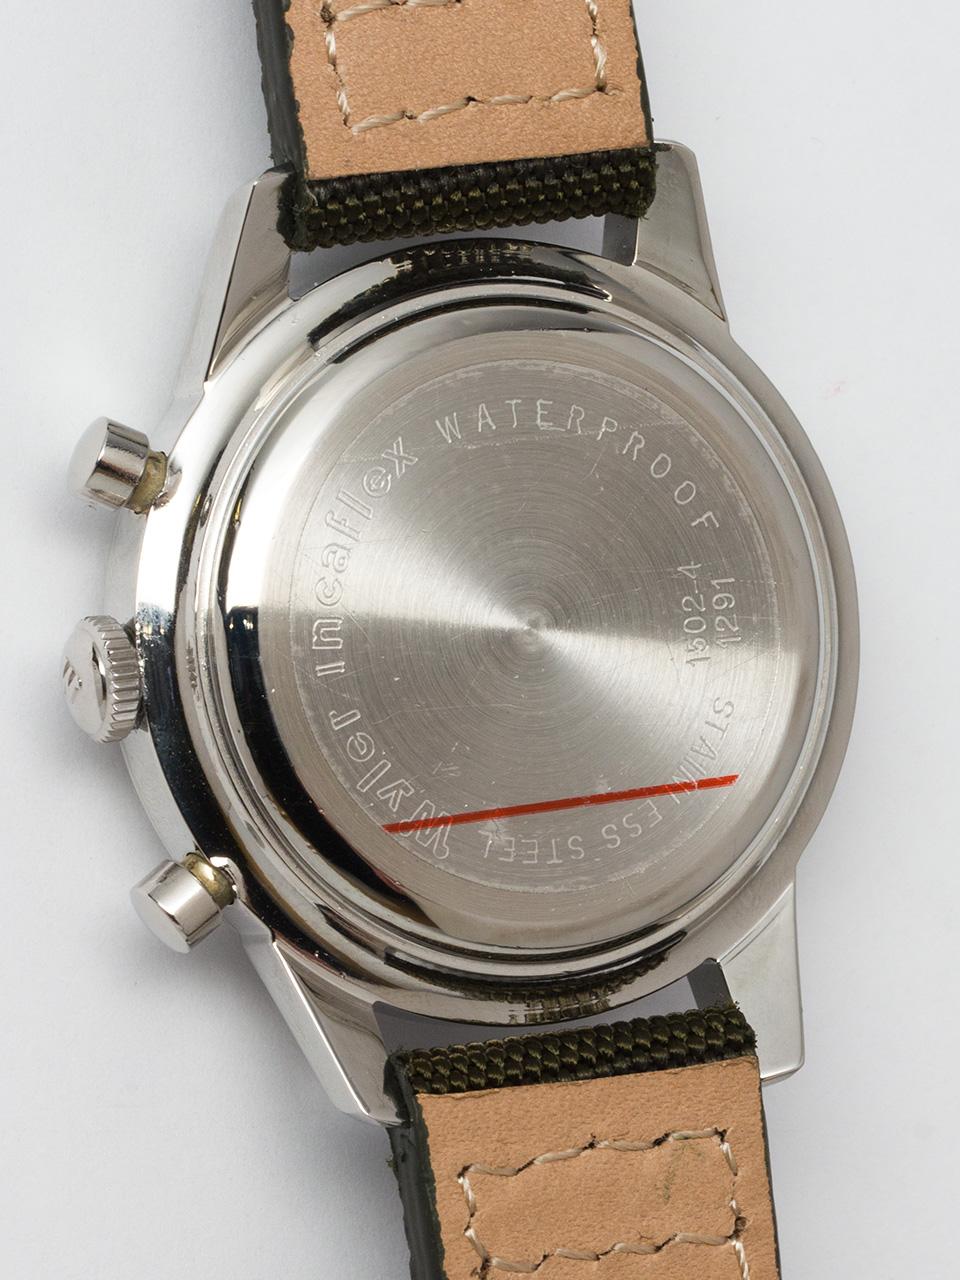 Wyler Incaflex Stainless Steel Chronograph Valjoux 72 circa 1960's